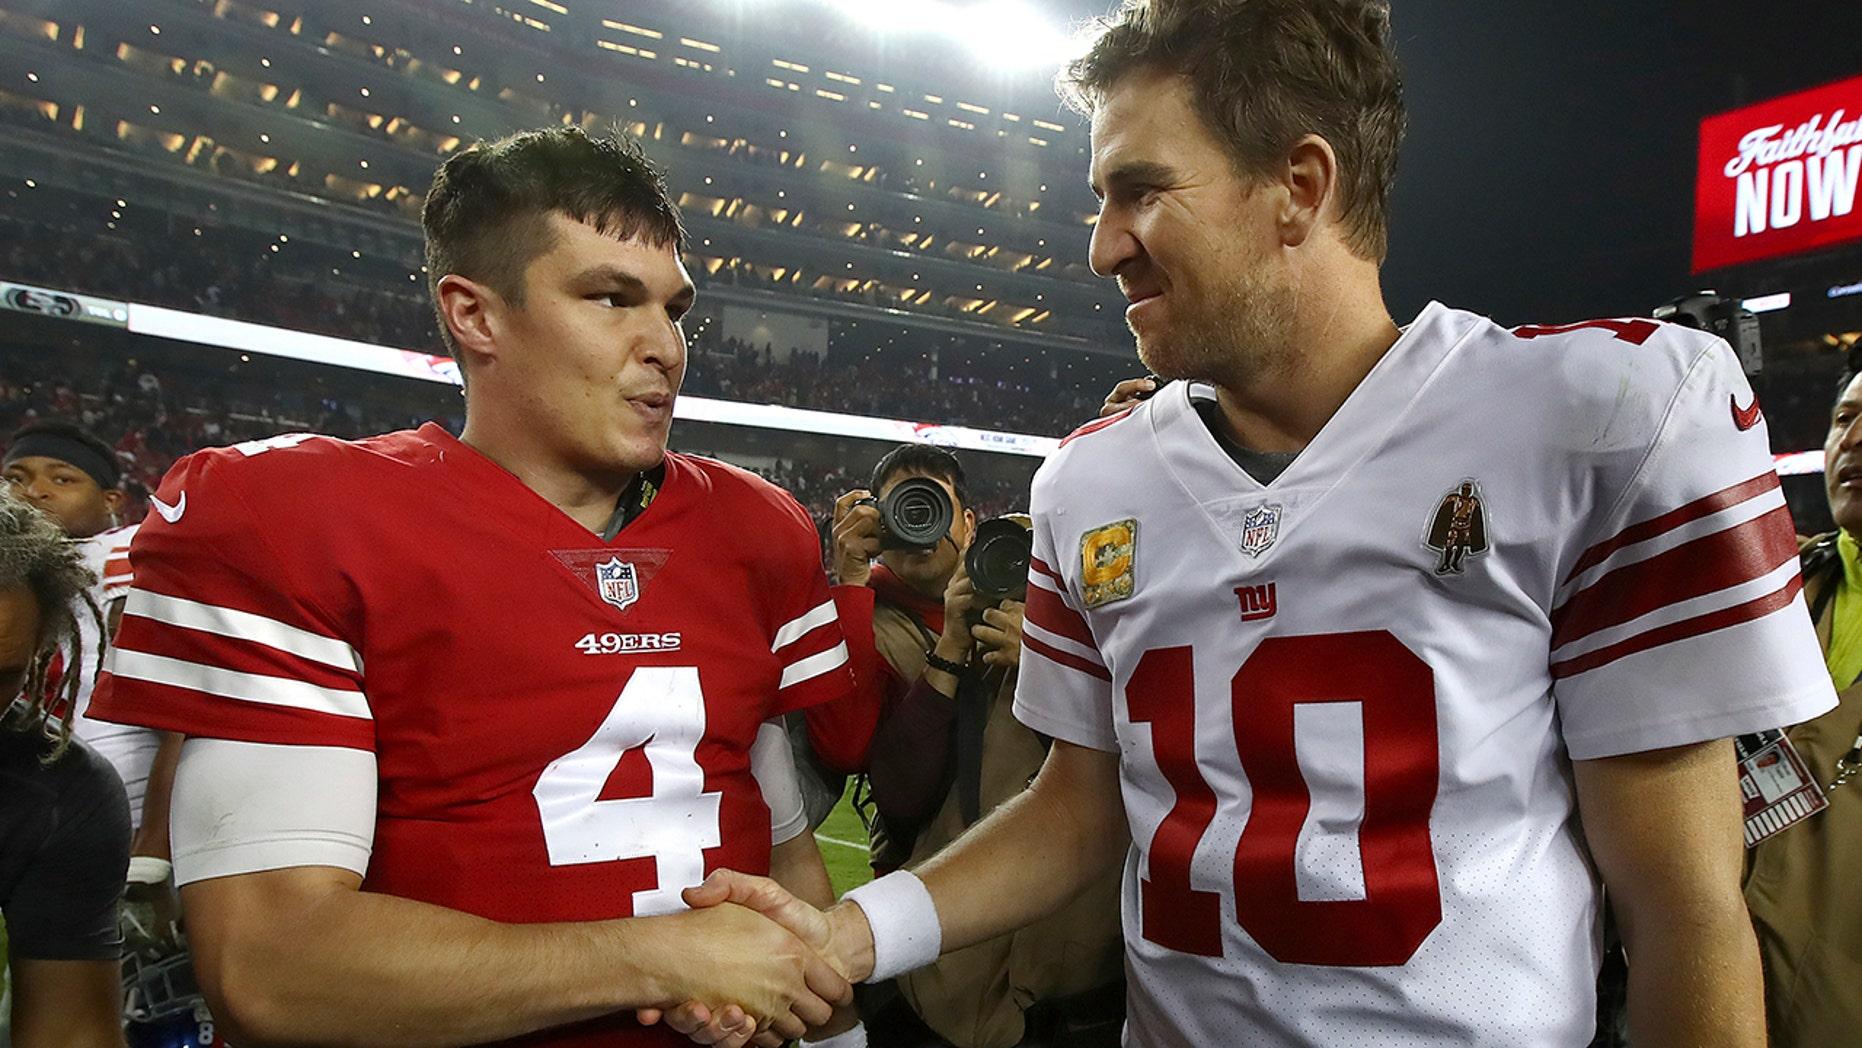 San Francisco 49ers quarterback Nick Mullens (4) shakes hands with New York Giants quarterback Eli Manning (10) after an NFL football game in Santa Clara, Calif., Monday, Nov. 12, 2018.